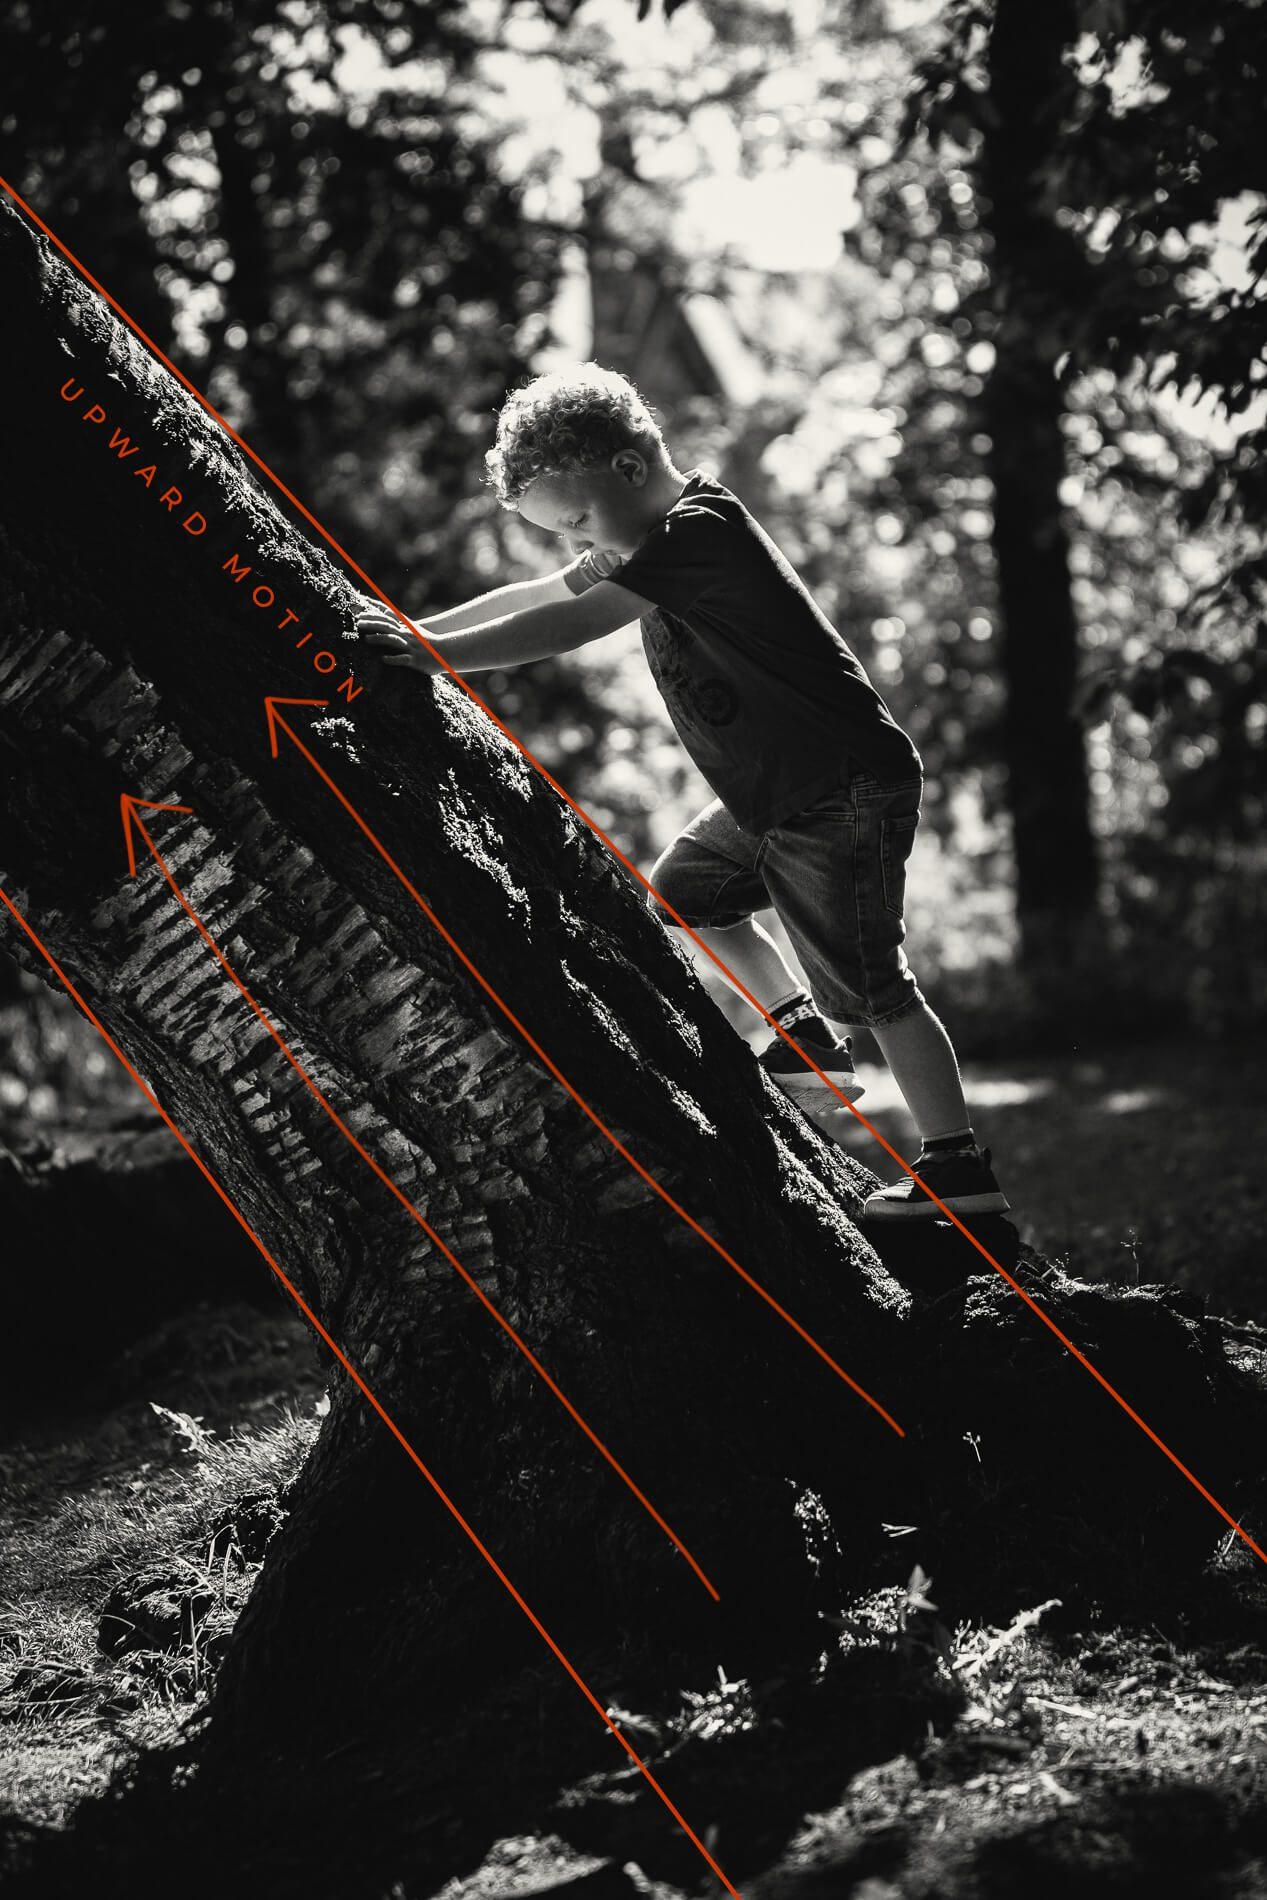 In Focus: 'The Climb' - Simon Wiffen Photography